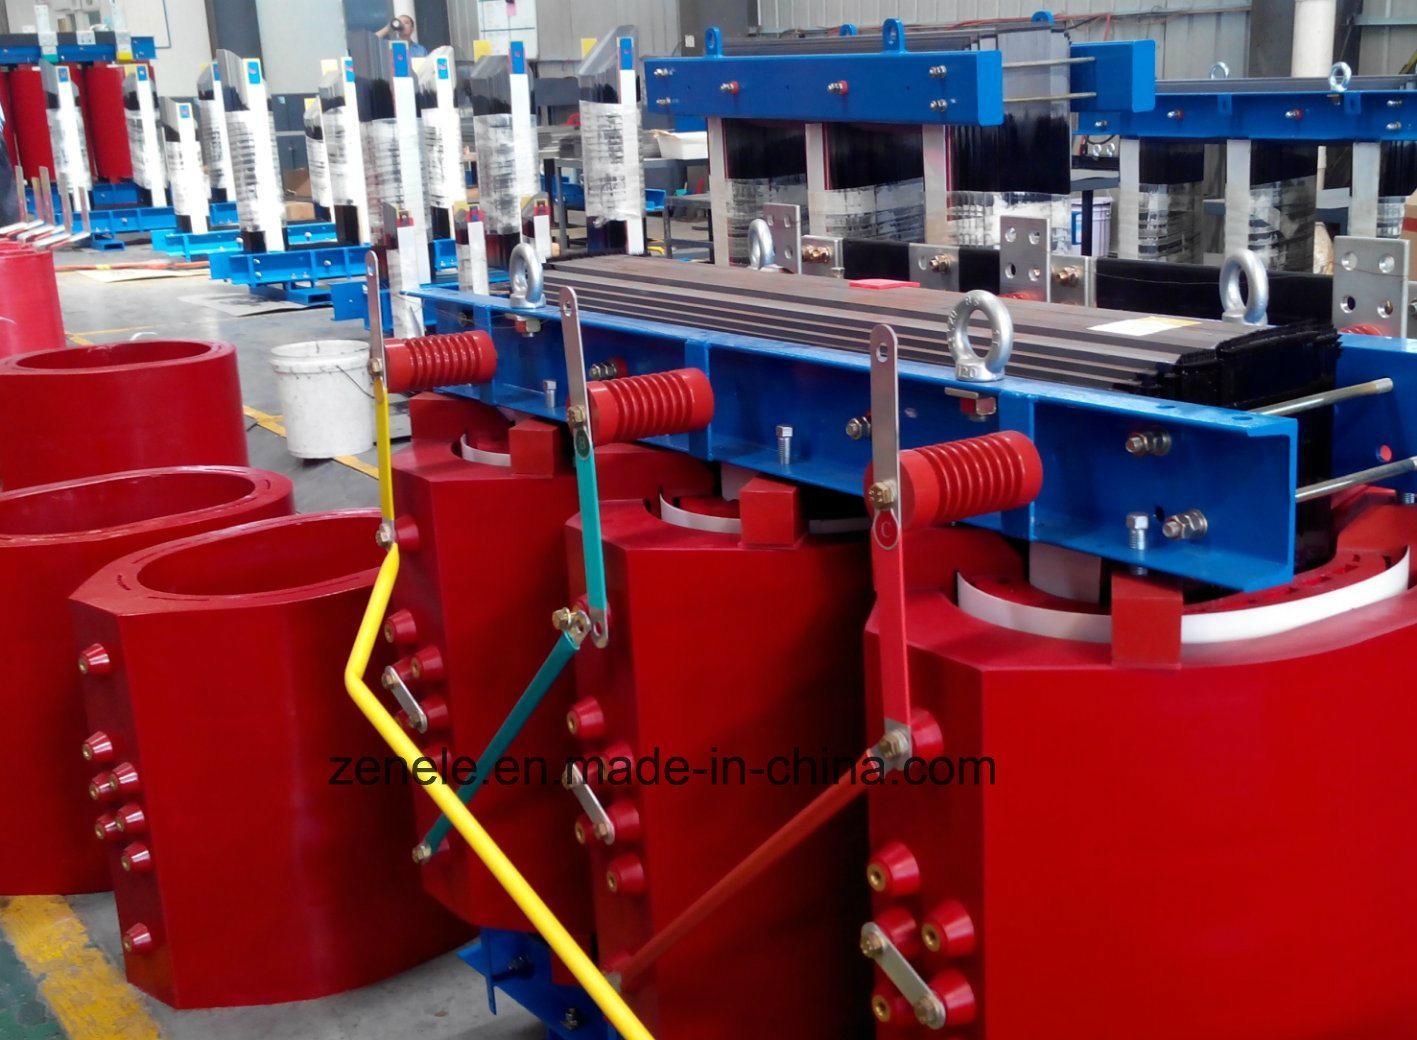 Scb10-630kv Three-Phase Dry Type Transformer